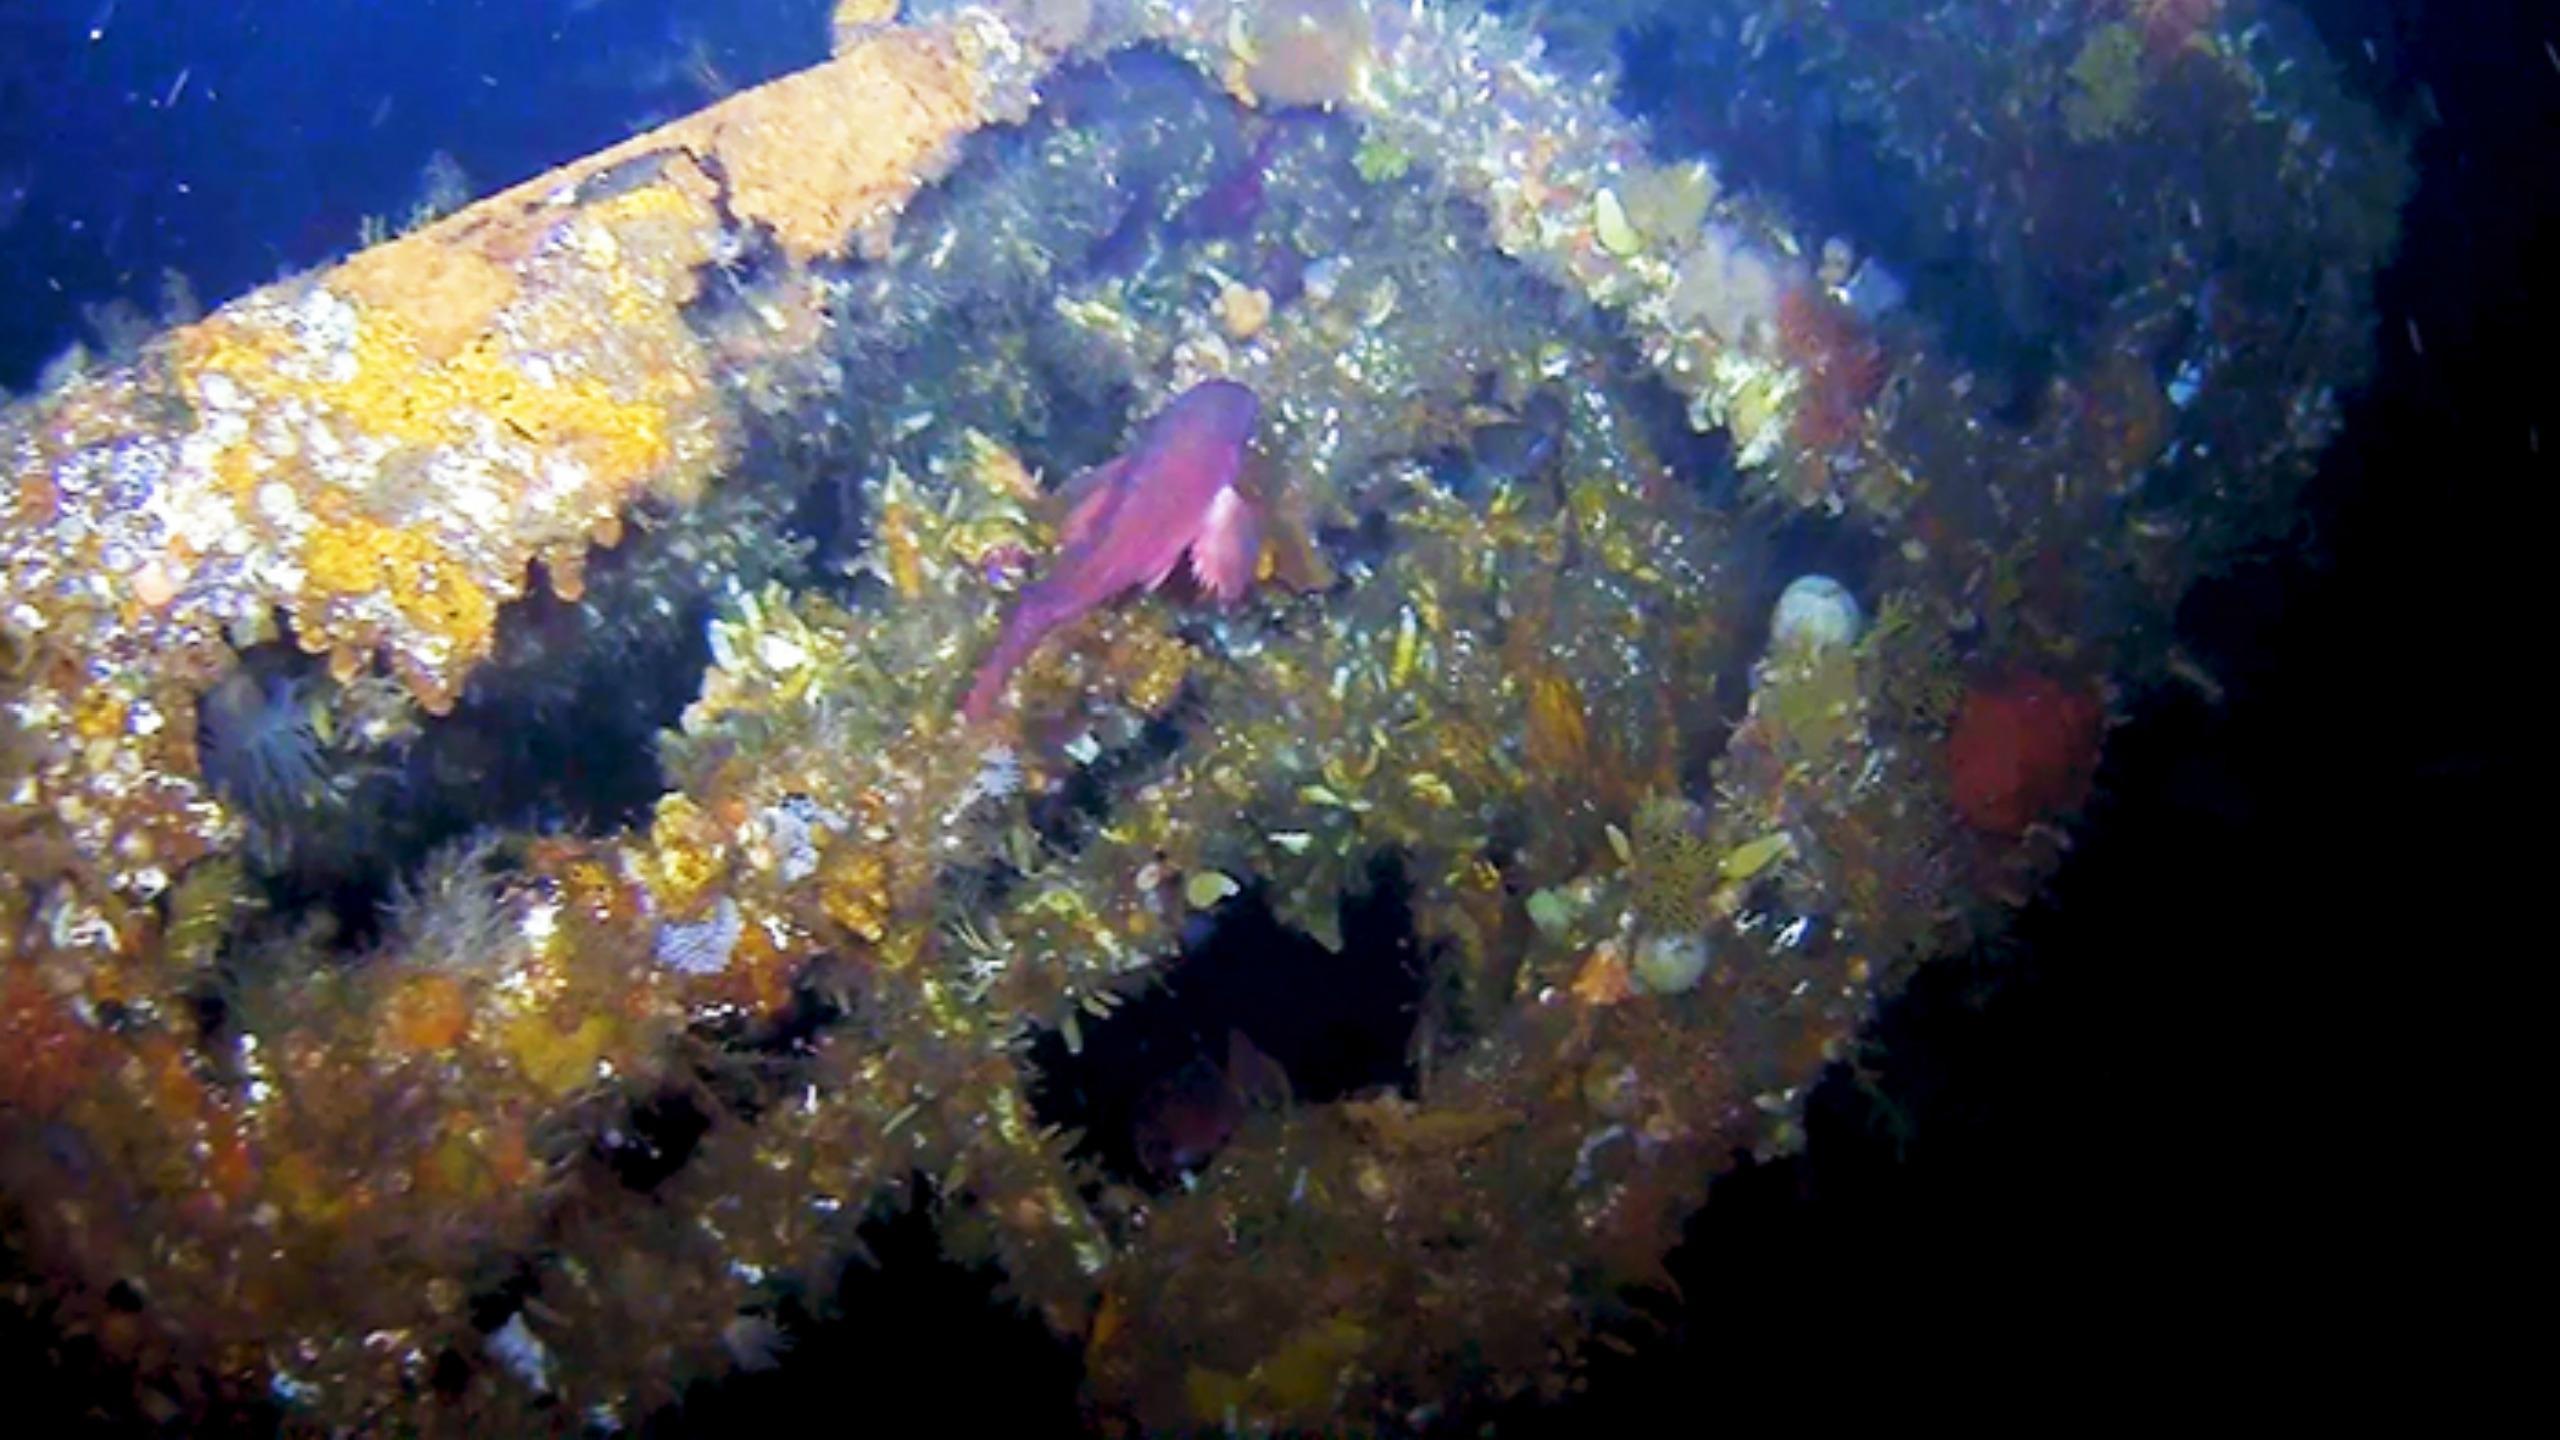 Coral-encrusted USS Abner Read stern wreckage